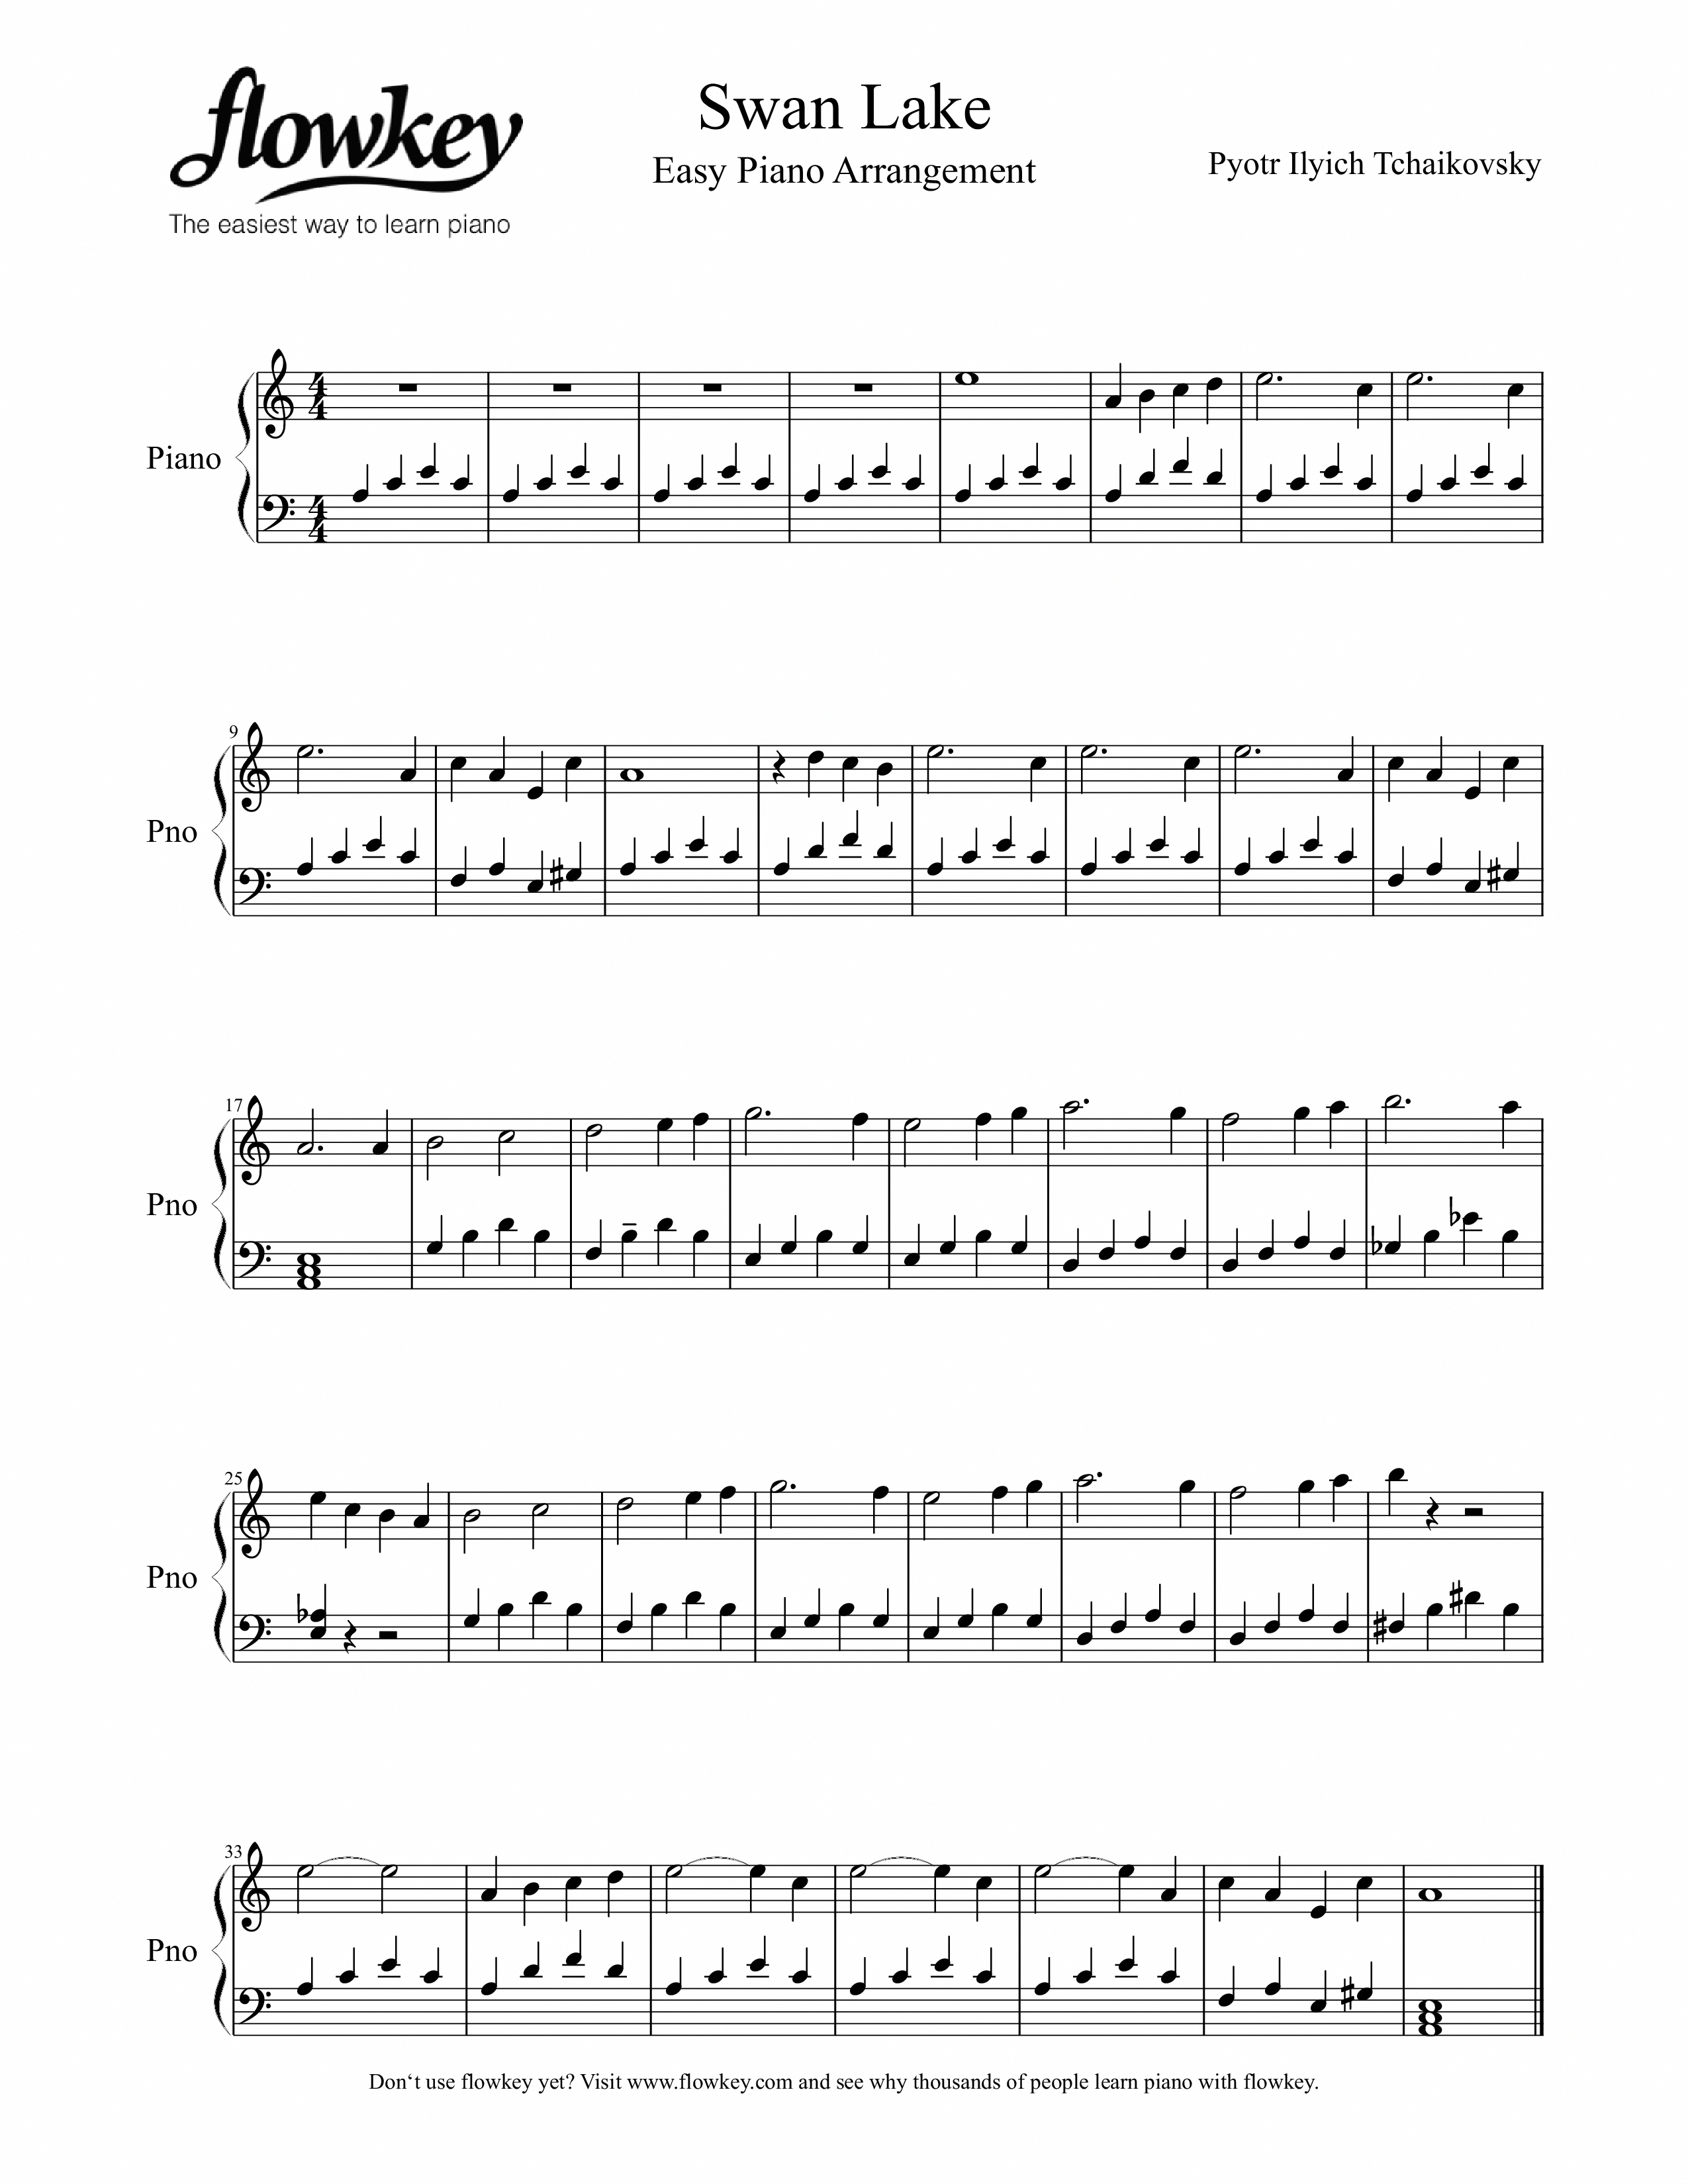 Peter Tchaikovsky : Swan Lake (Easy piano arrangement for beginners